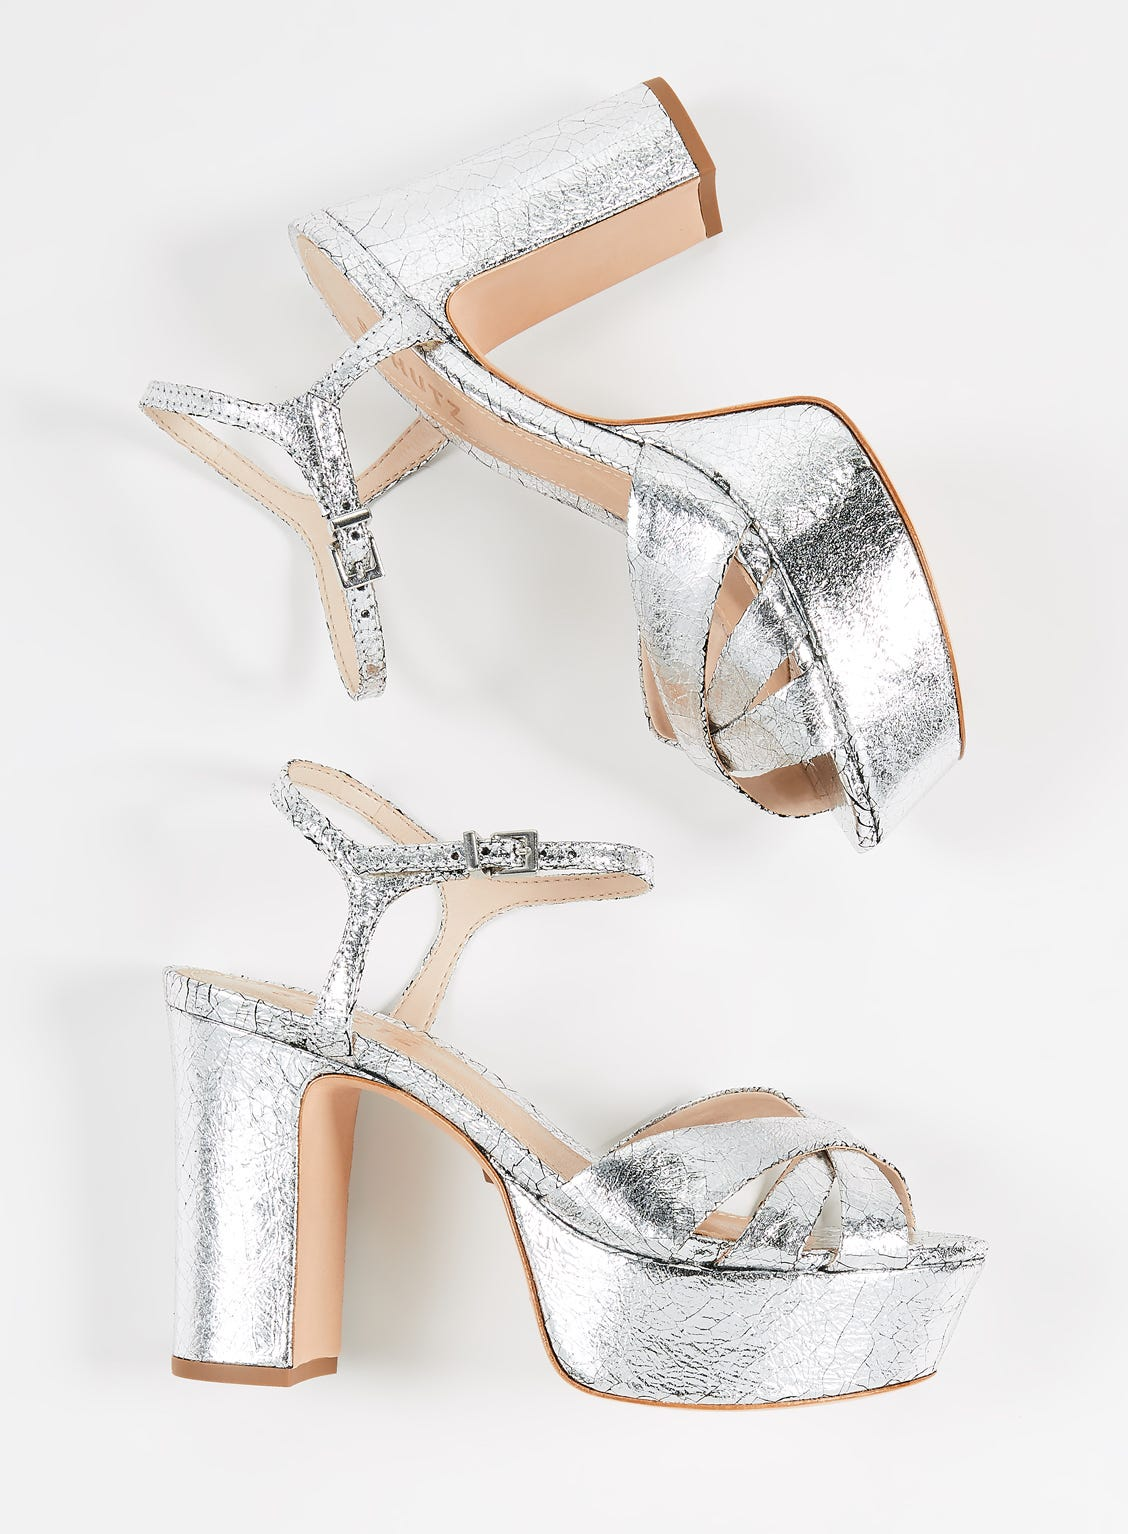 1607217de5 Comfortable Heels And Wedding Party Shoes For Dancing